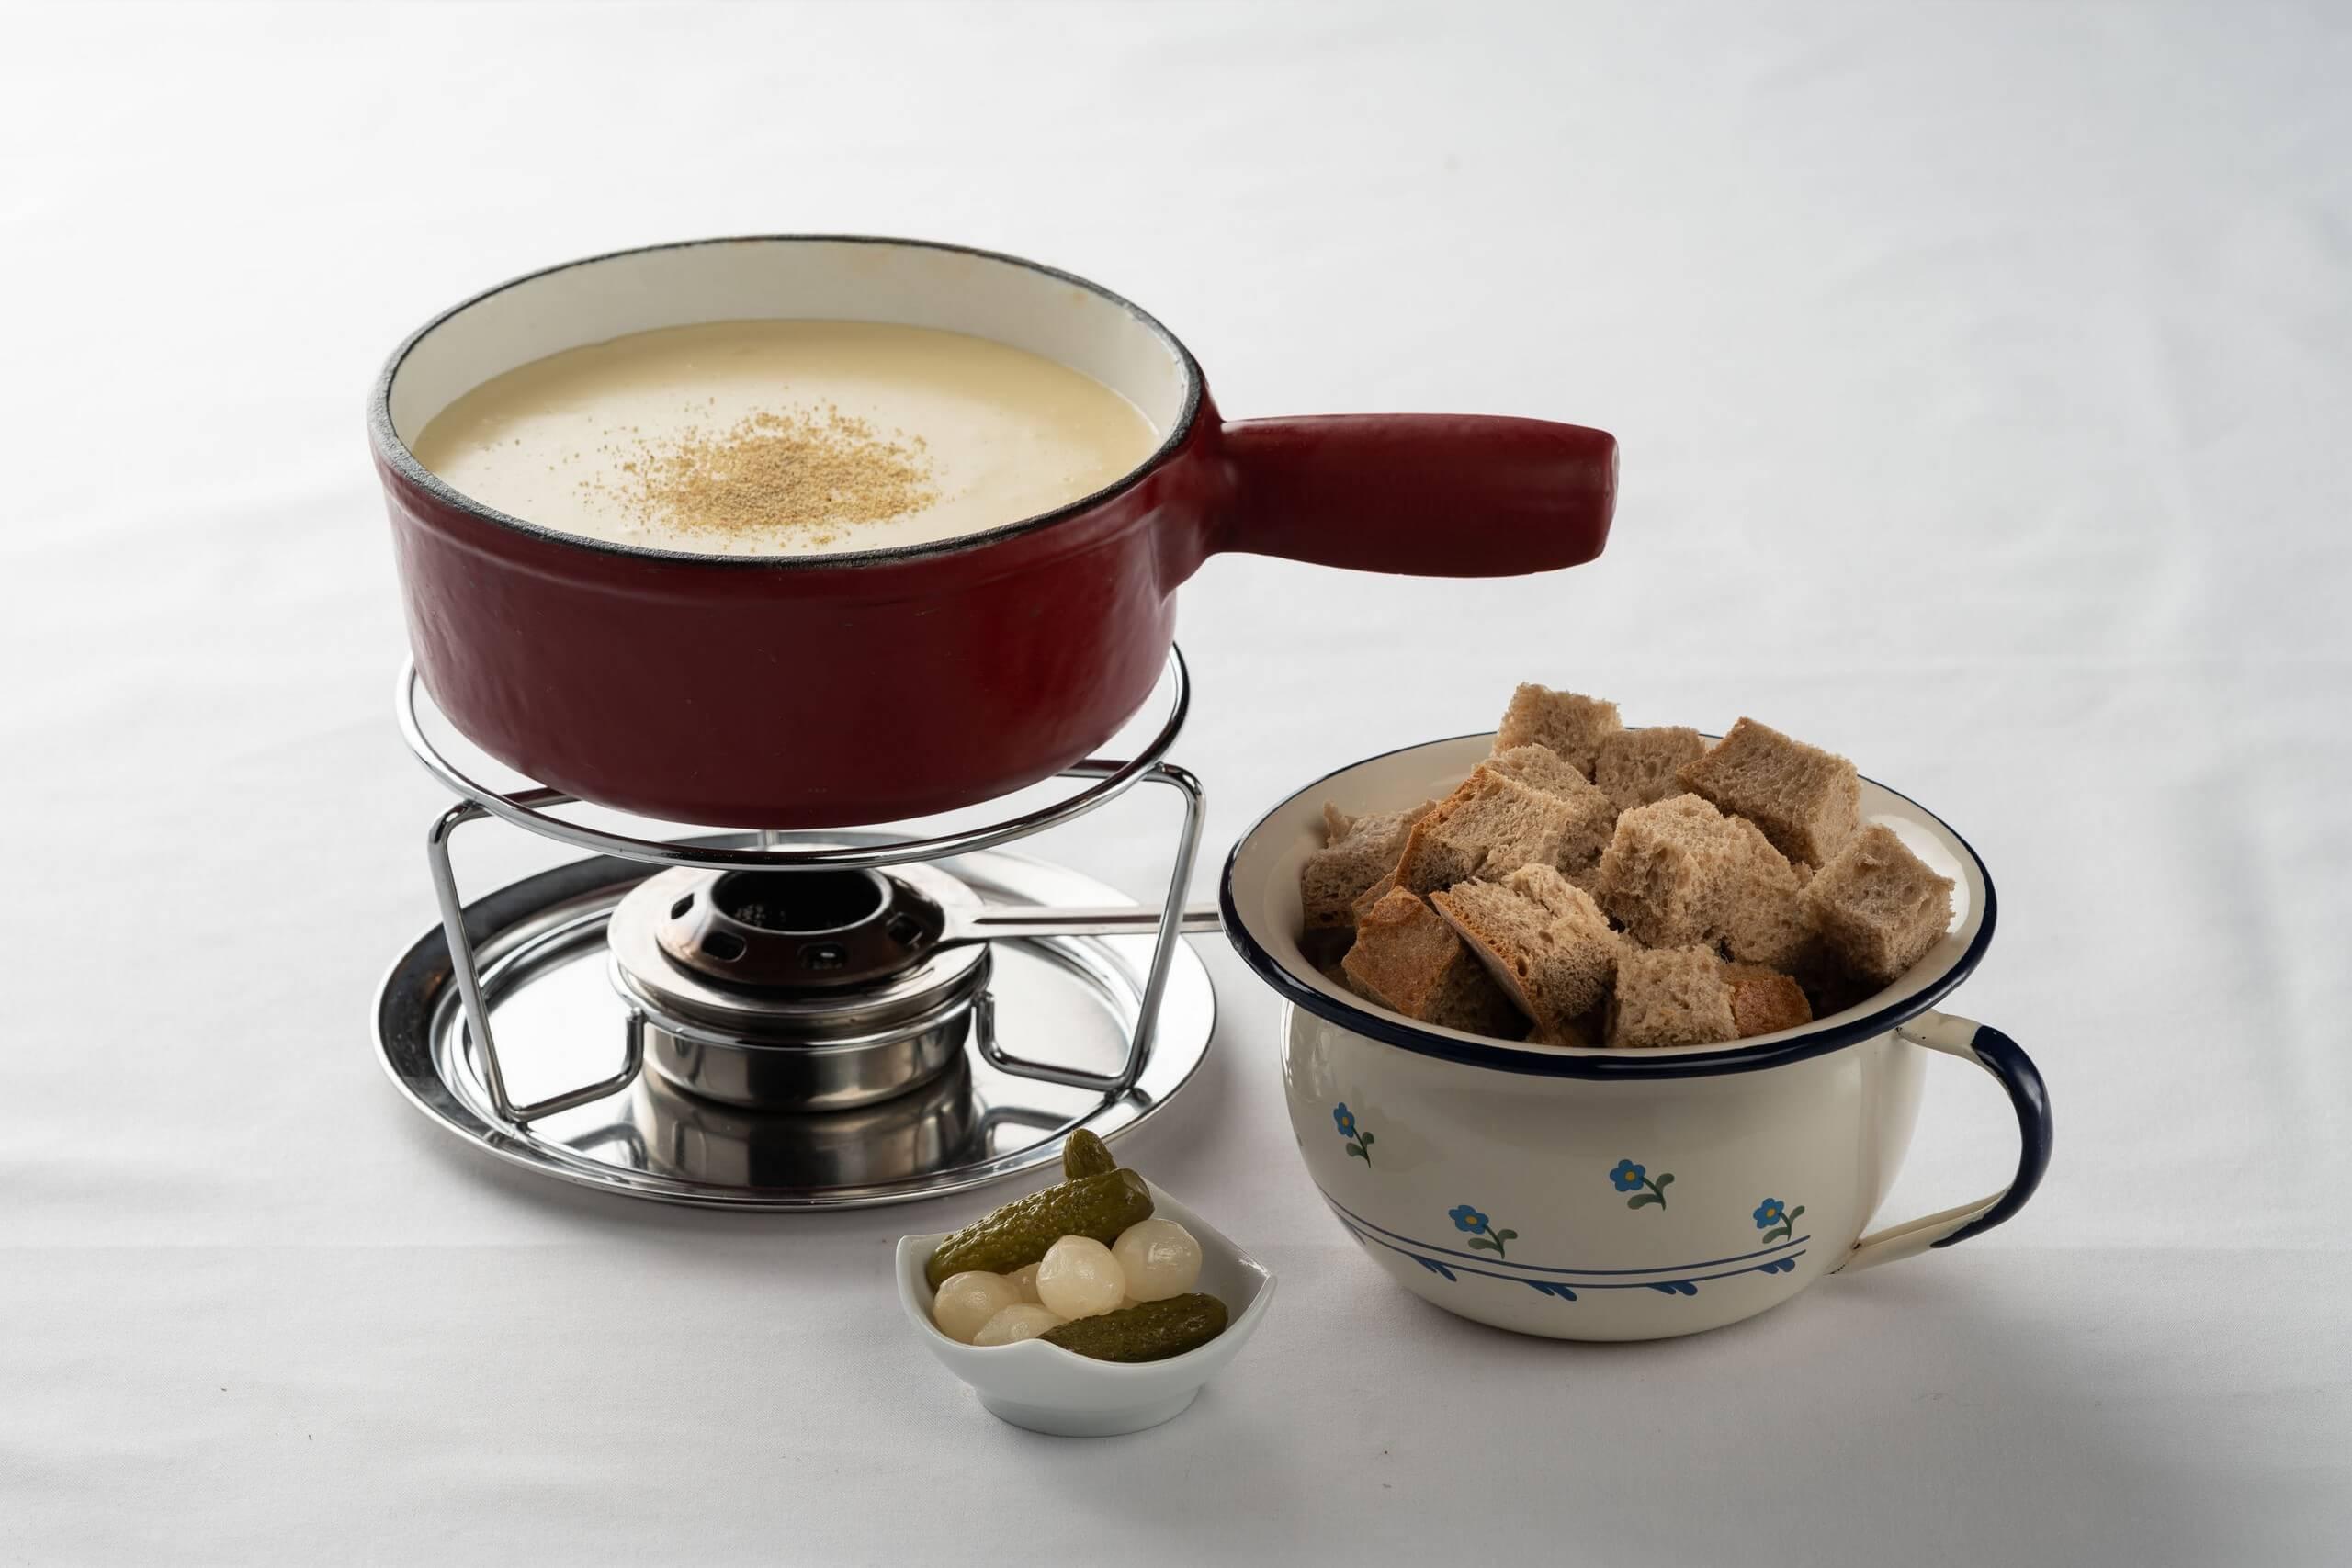 restaurant-spycher-fondue-brot